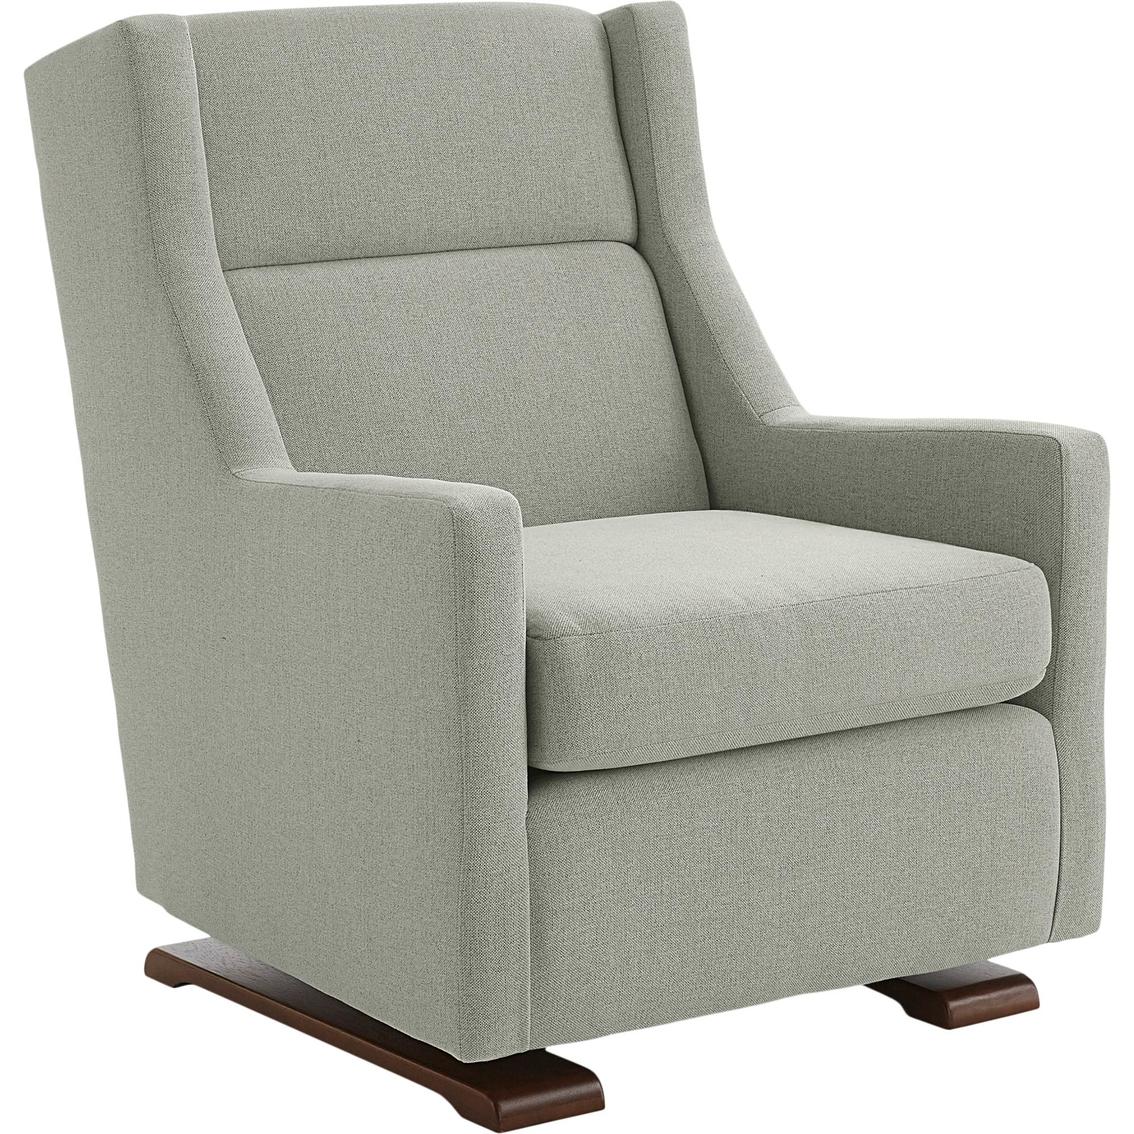 Best Home Mandini Swivel Glider Chairs Recliners Home